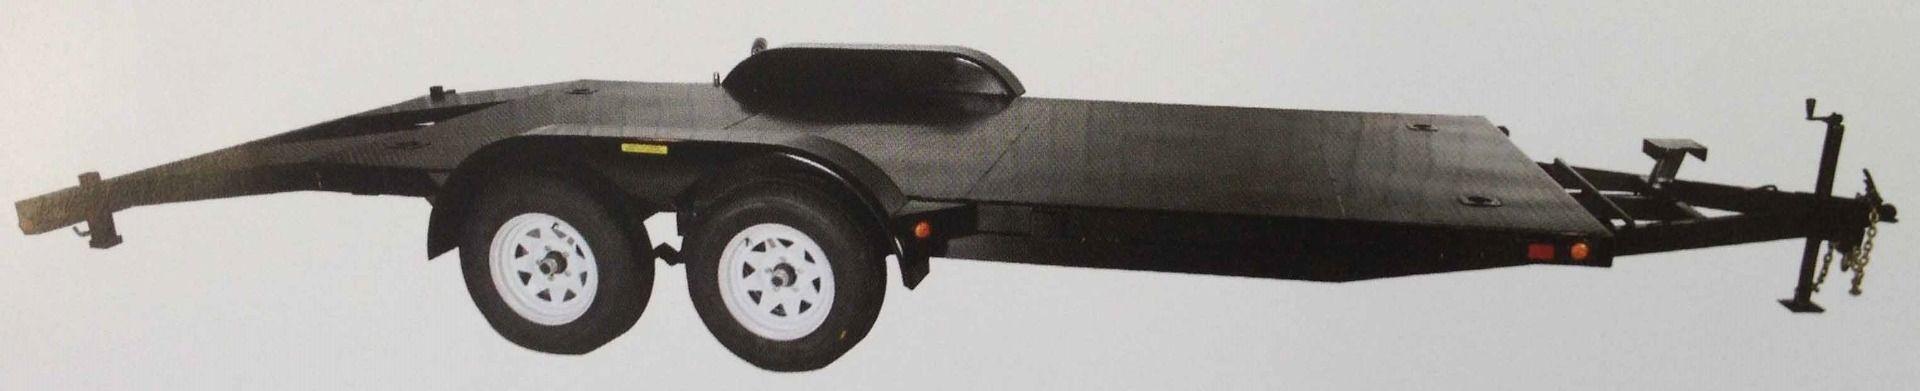 model CC 7000 8016